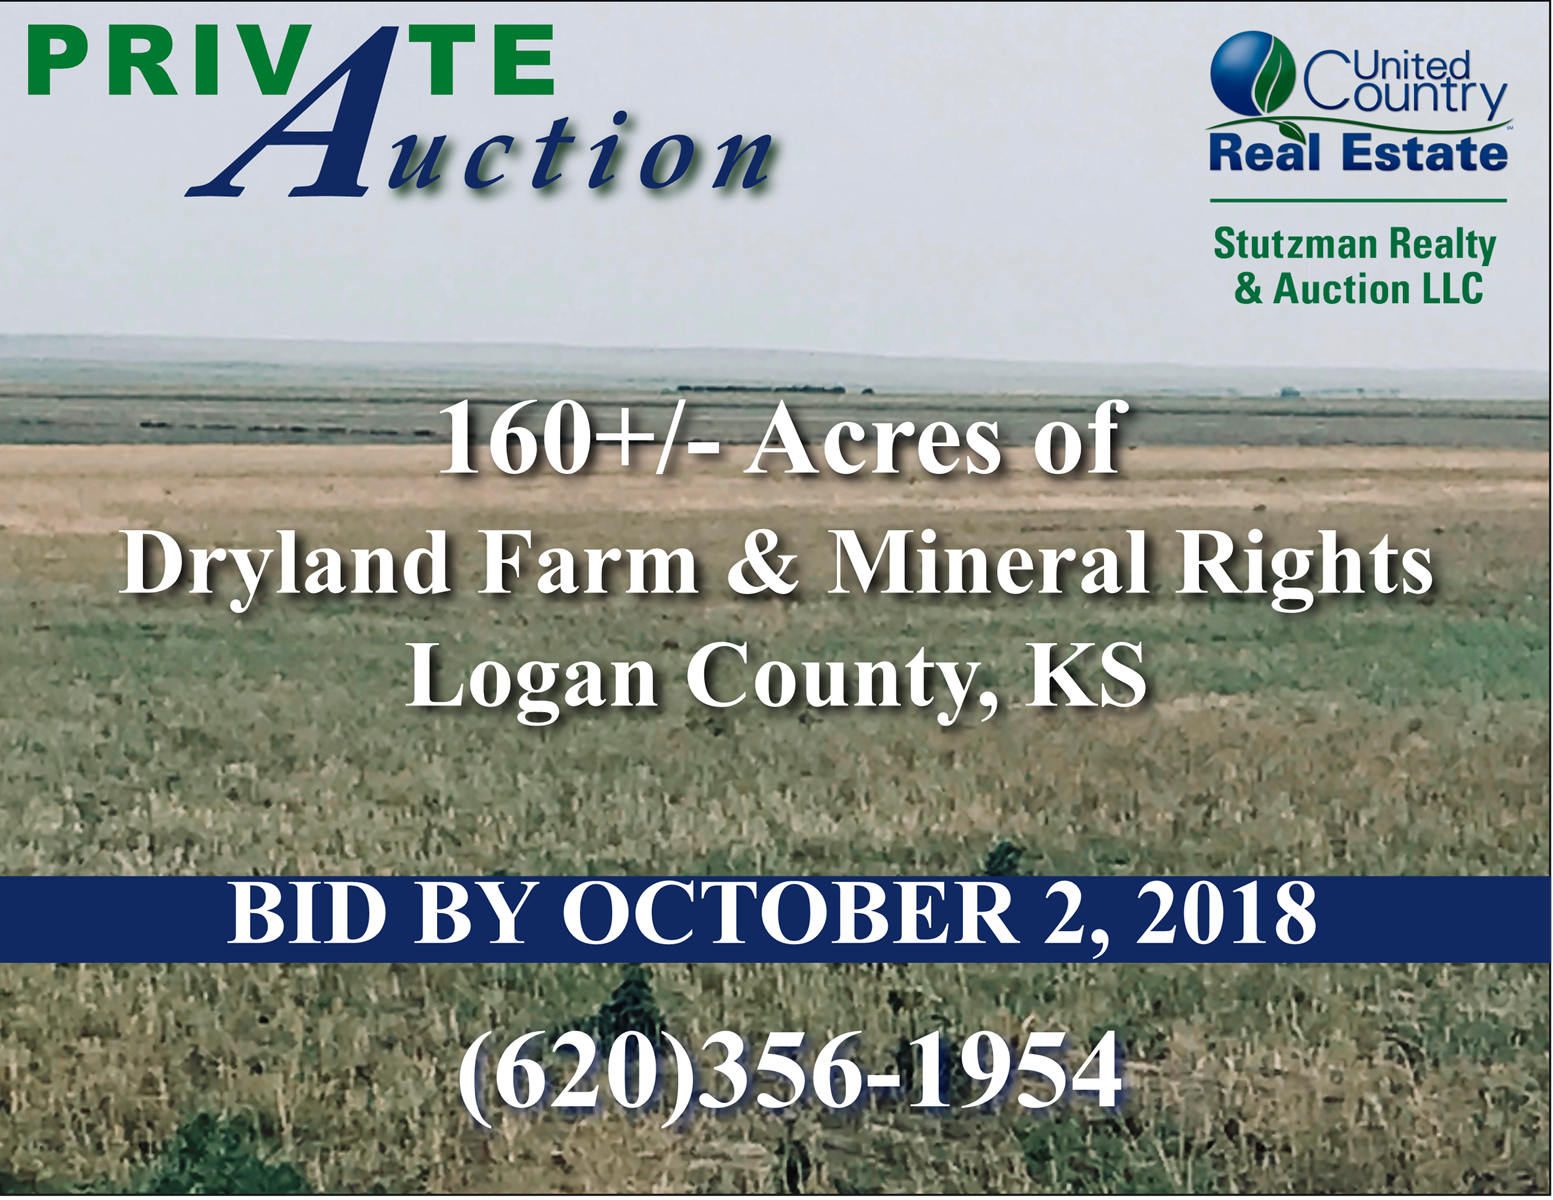 160+/- ACRES OF DRYLAND FARM & MINERAL RIGHTS, LOGAN COUNTY, KS